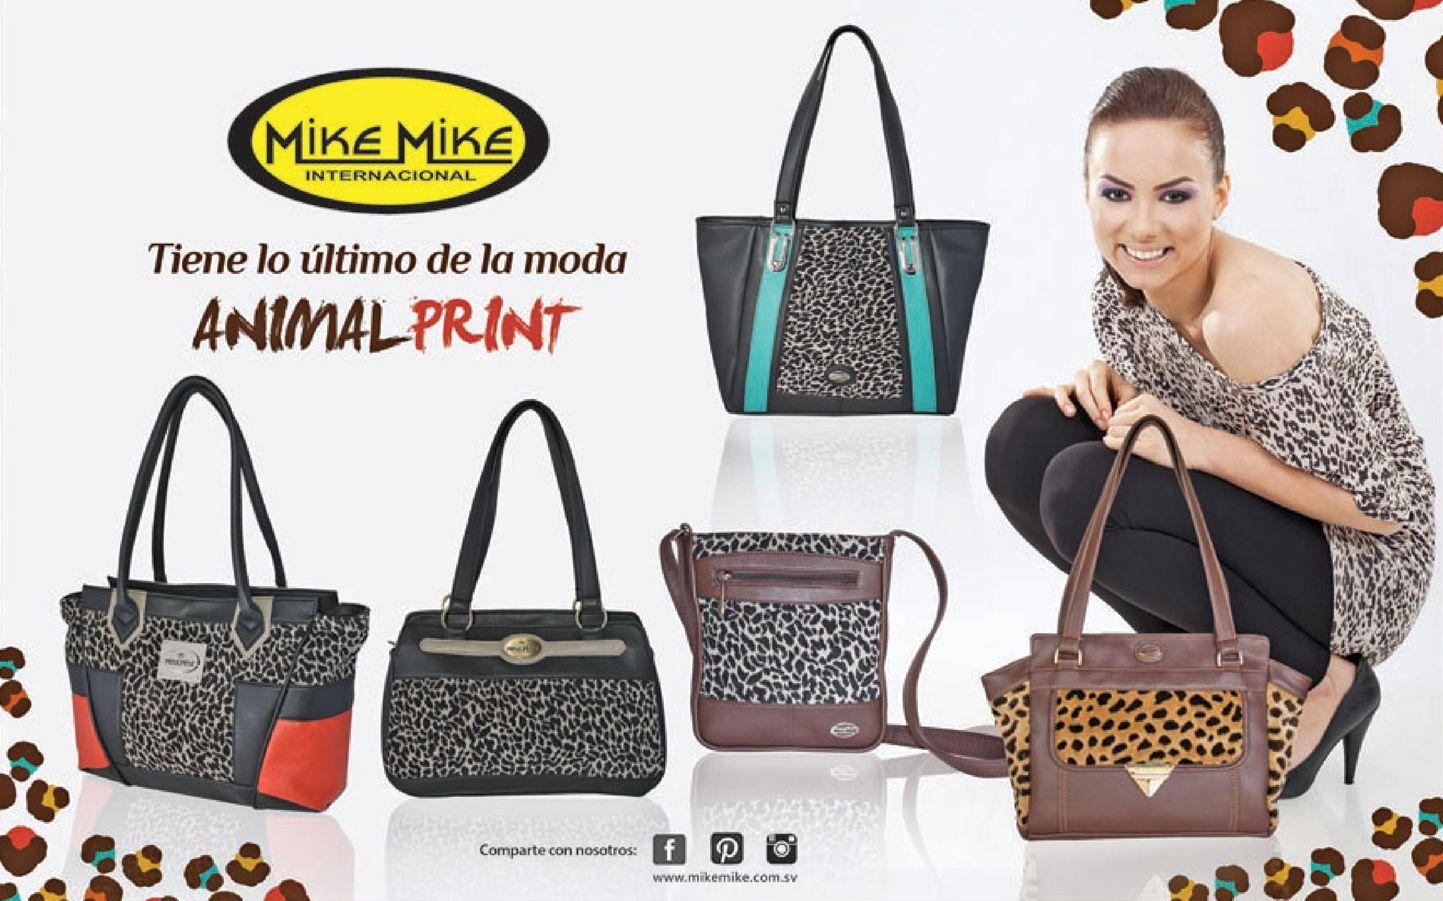 Mike mike international lo ultimo en la moda animal print - Lo ultimo en moda ...